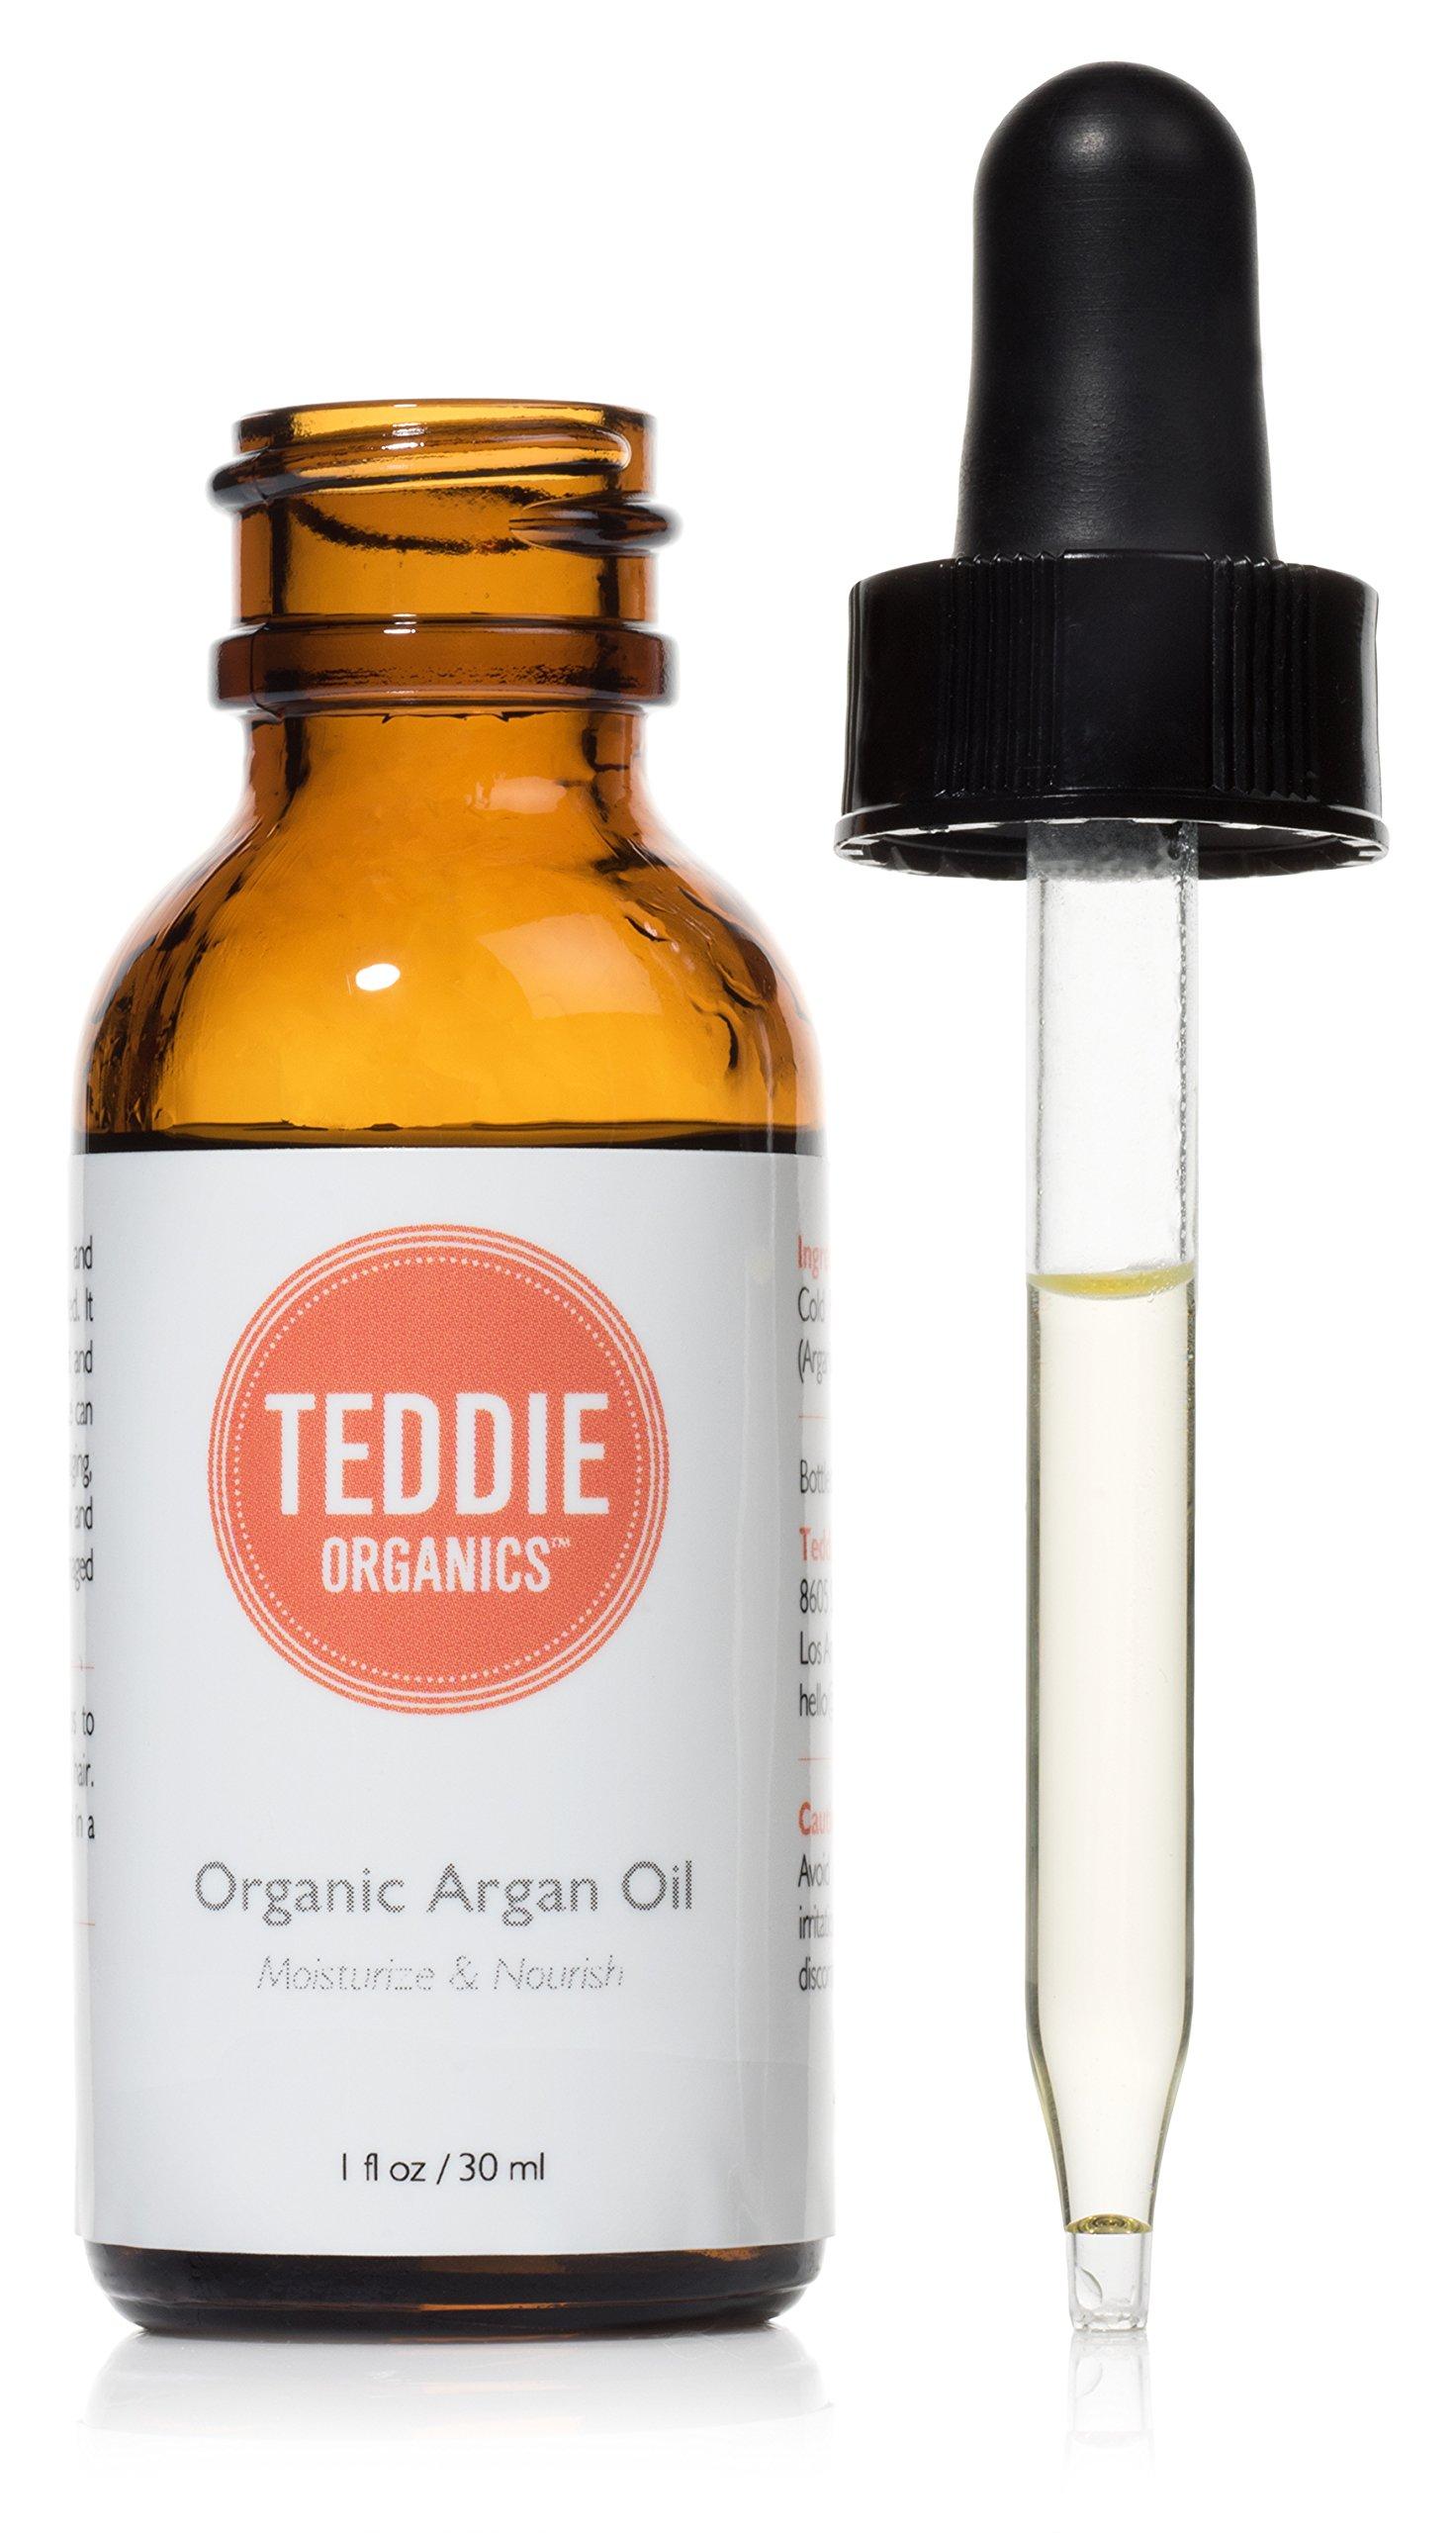 Teddie Organics Pure Moroccan Argan Oil for Hair Face Skin - Virgin Organic Argan Oil Cold Pressed Unrefined 1oz